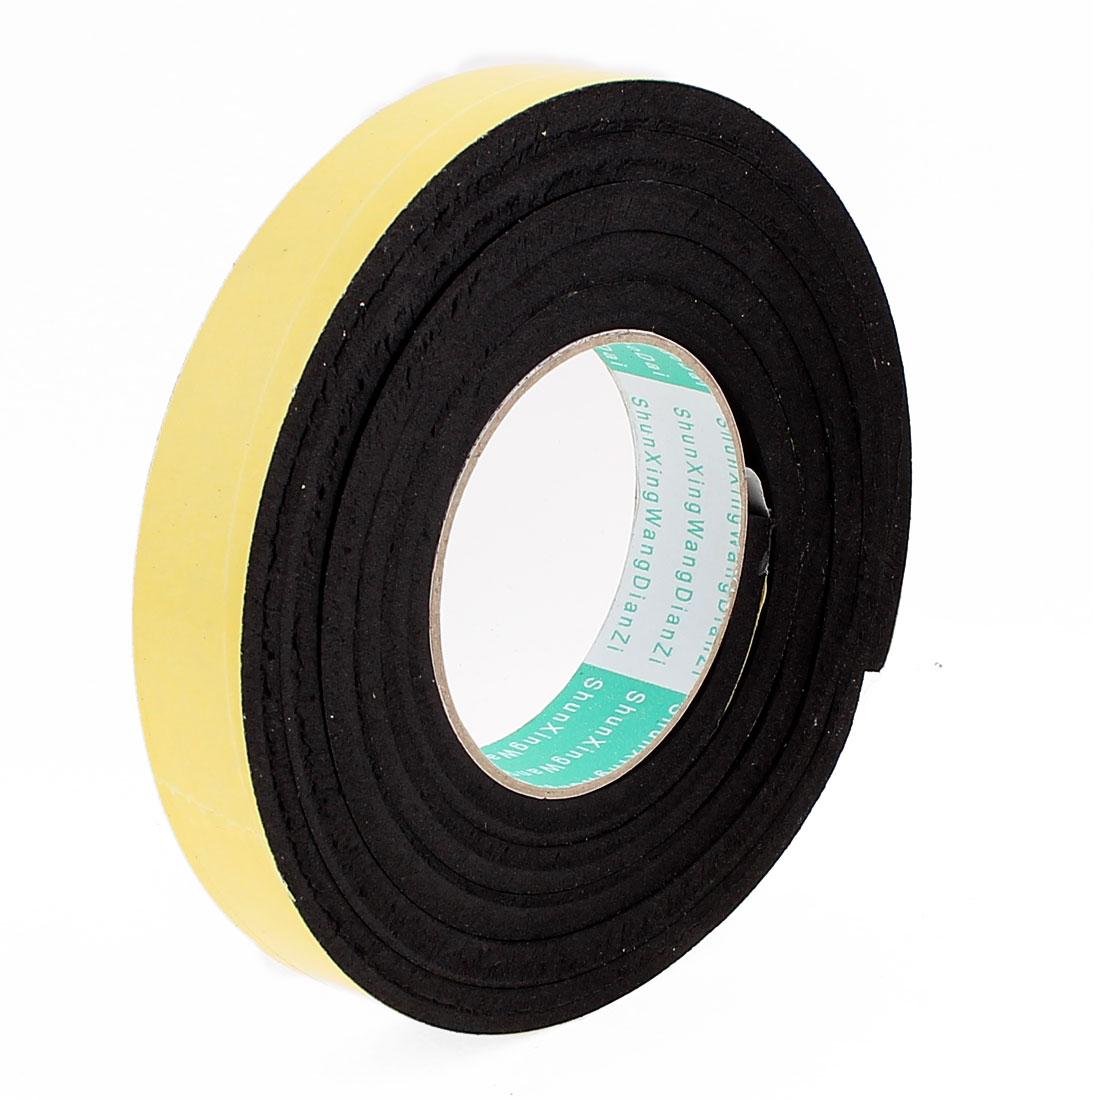 2 Meters 25mm x 8mm Single Side Adhesive EVA Foam Sealing Tap